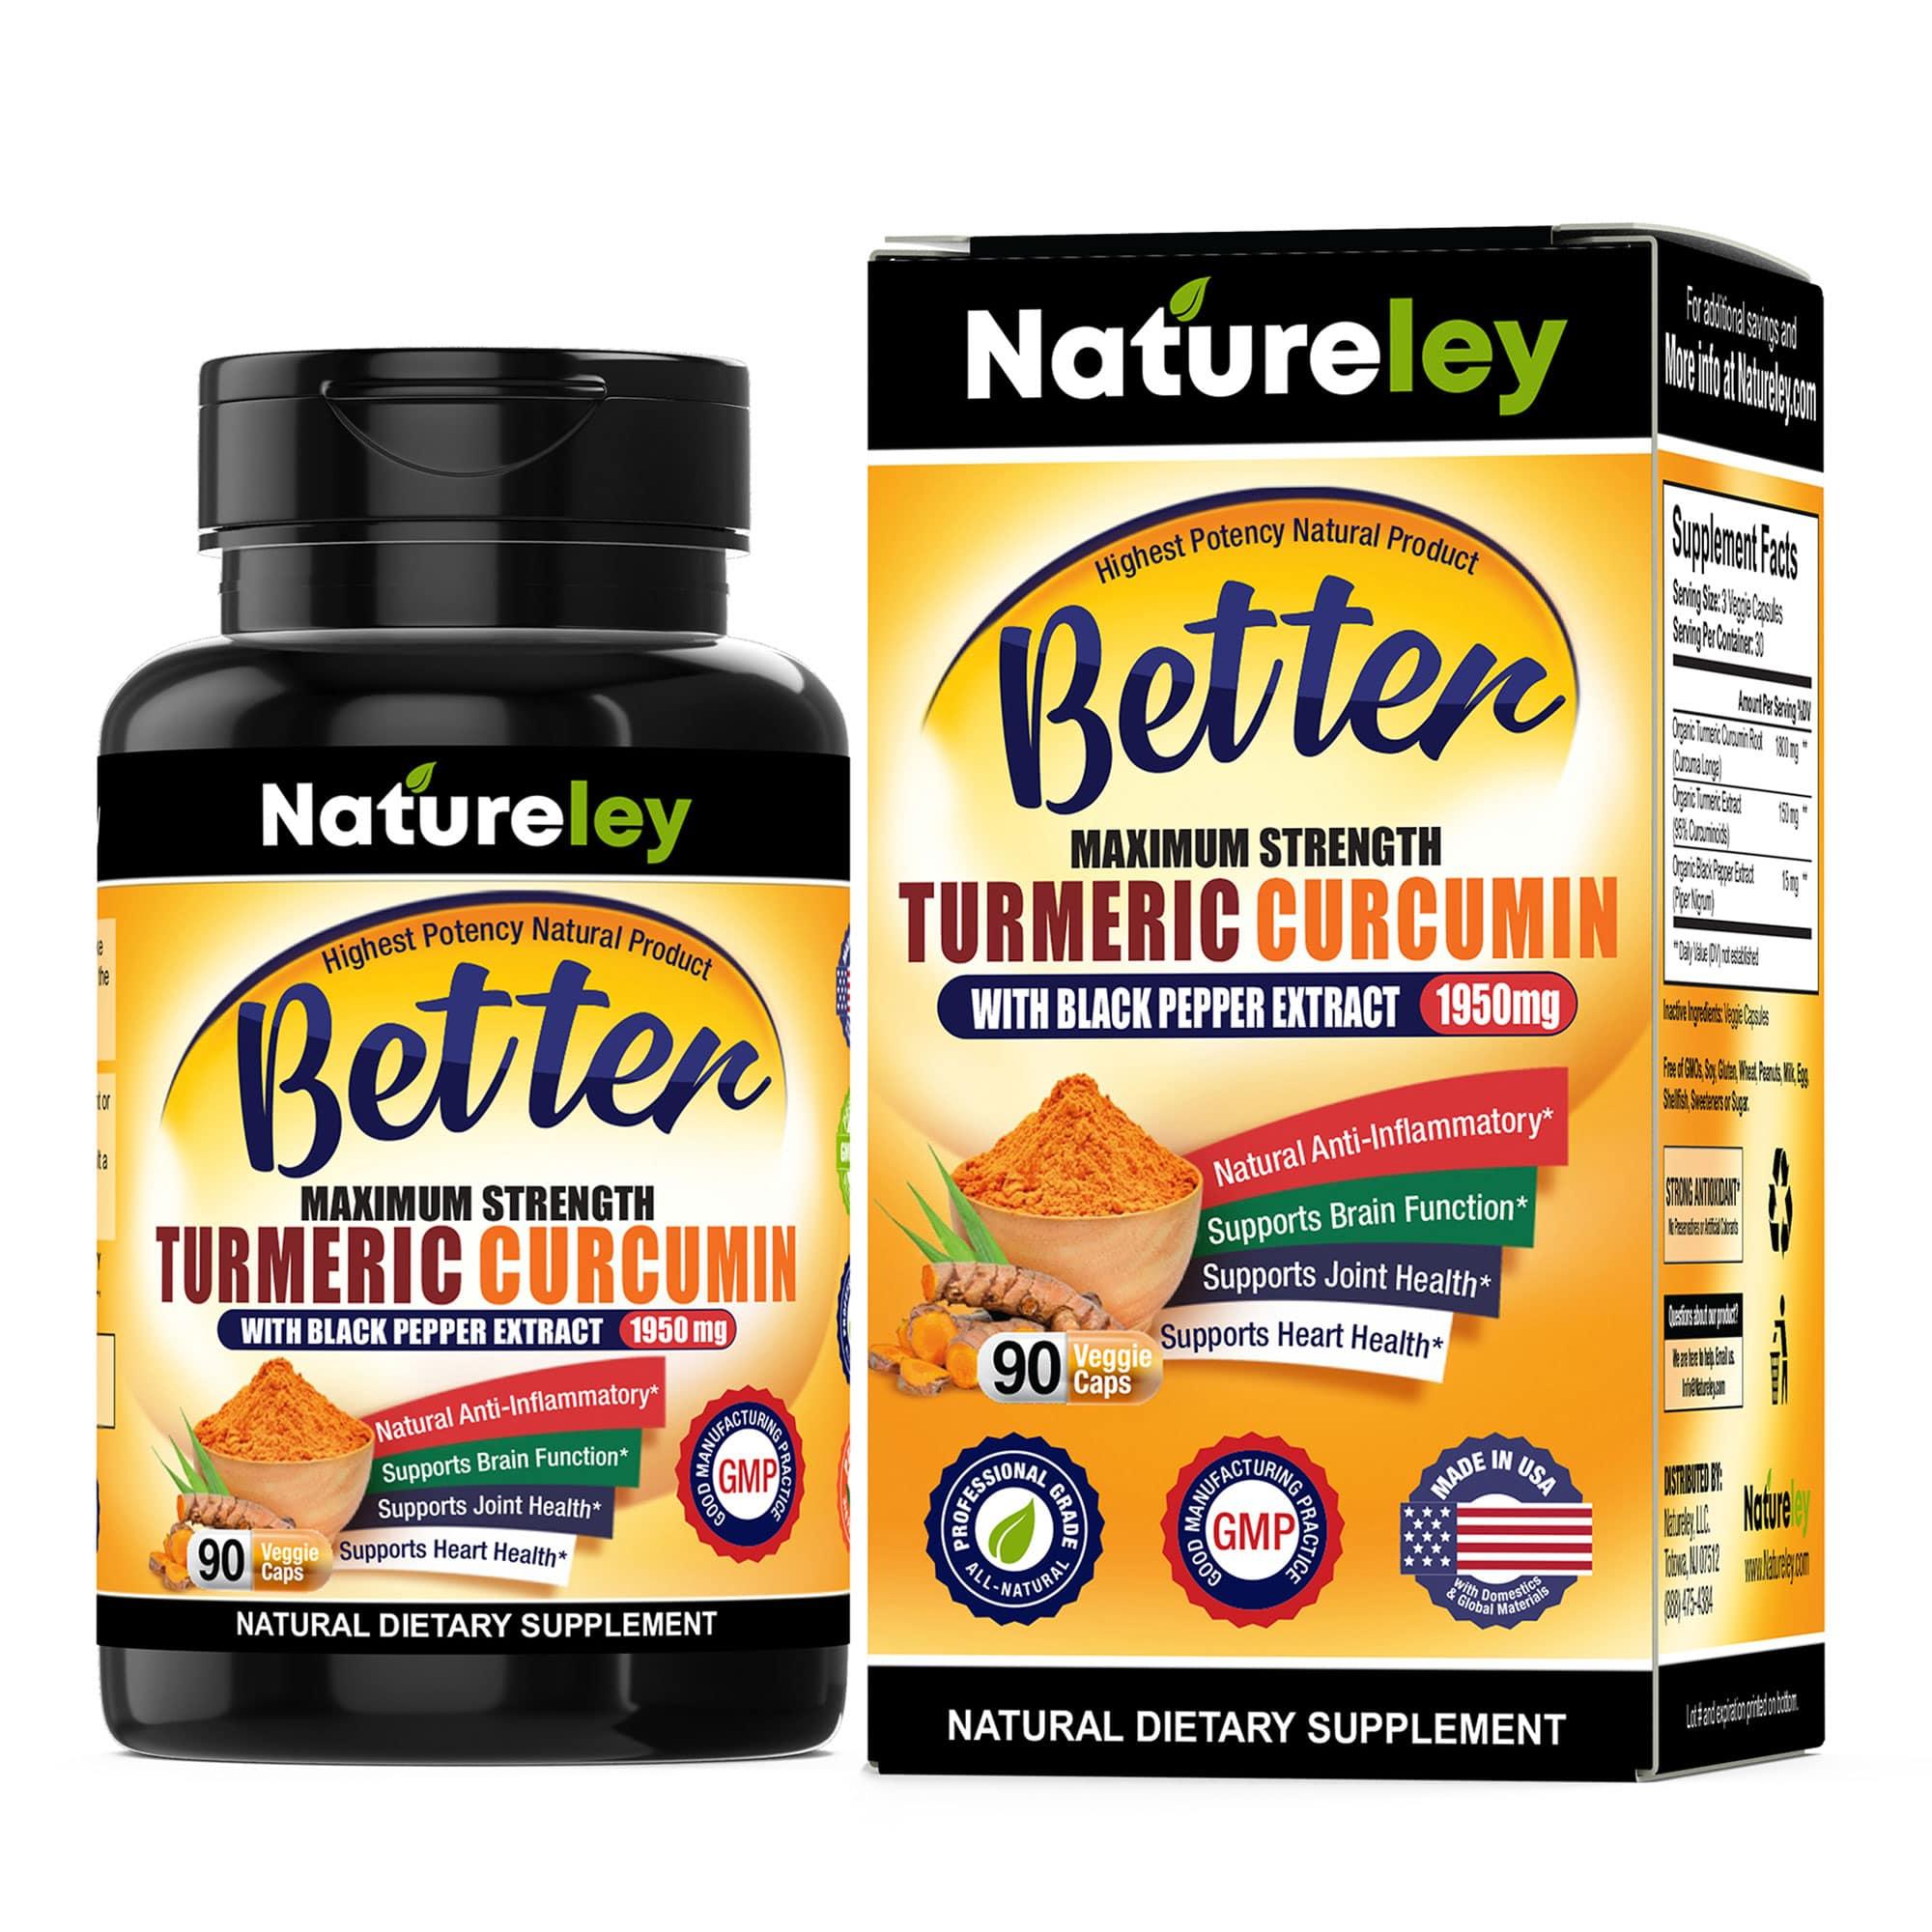 Organic Turmeric Curcumin with Black Pepper Extract - 1950 mg 90 Caps